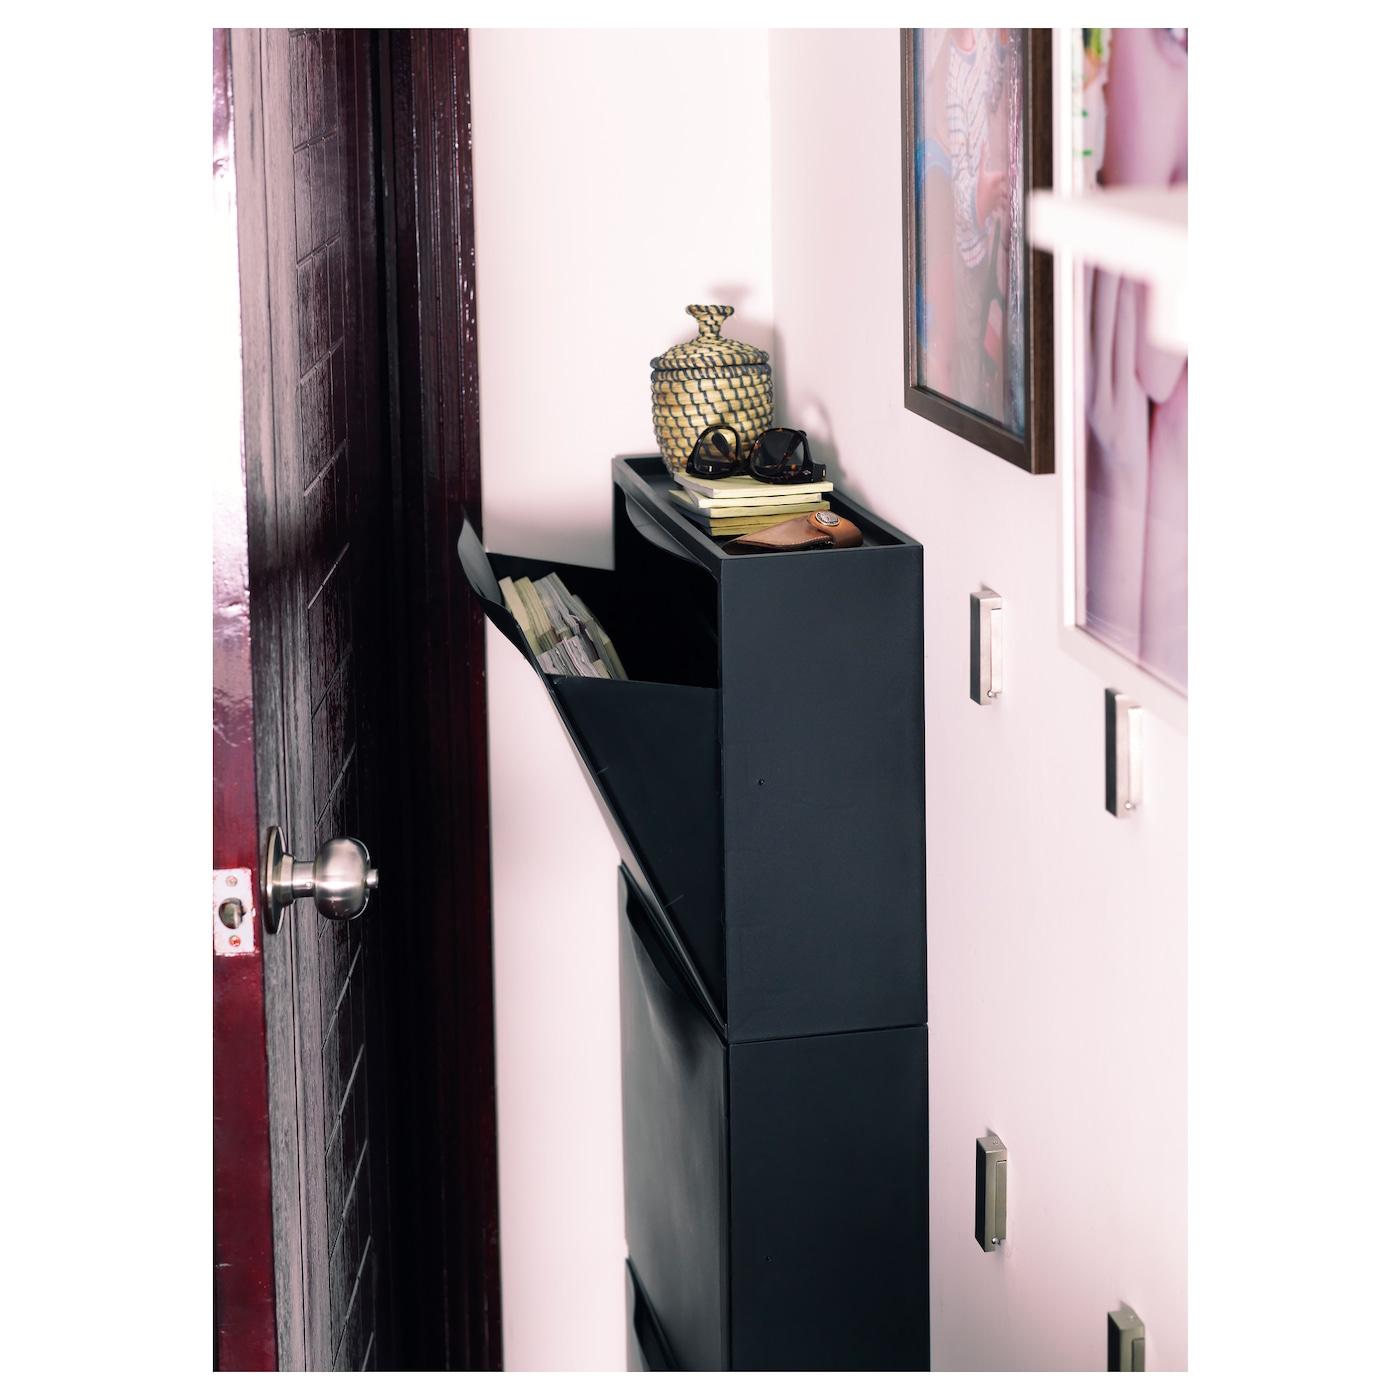 storage us trones cabinet catalog ikea shoe products en